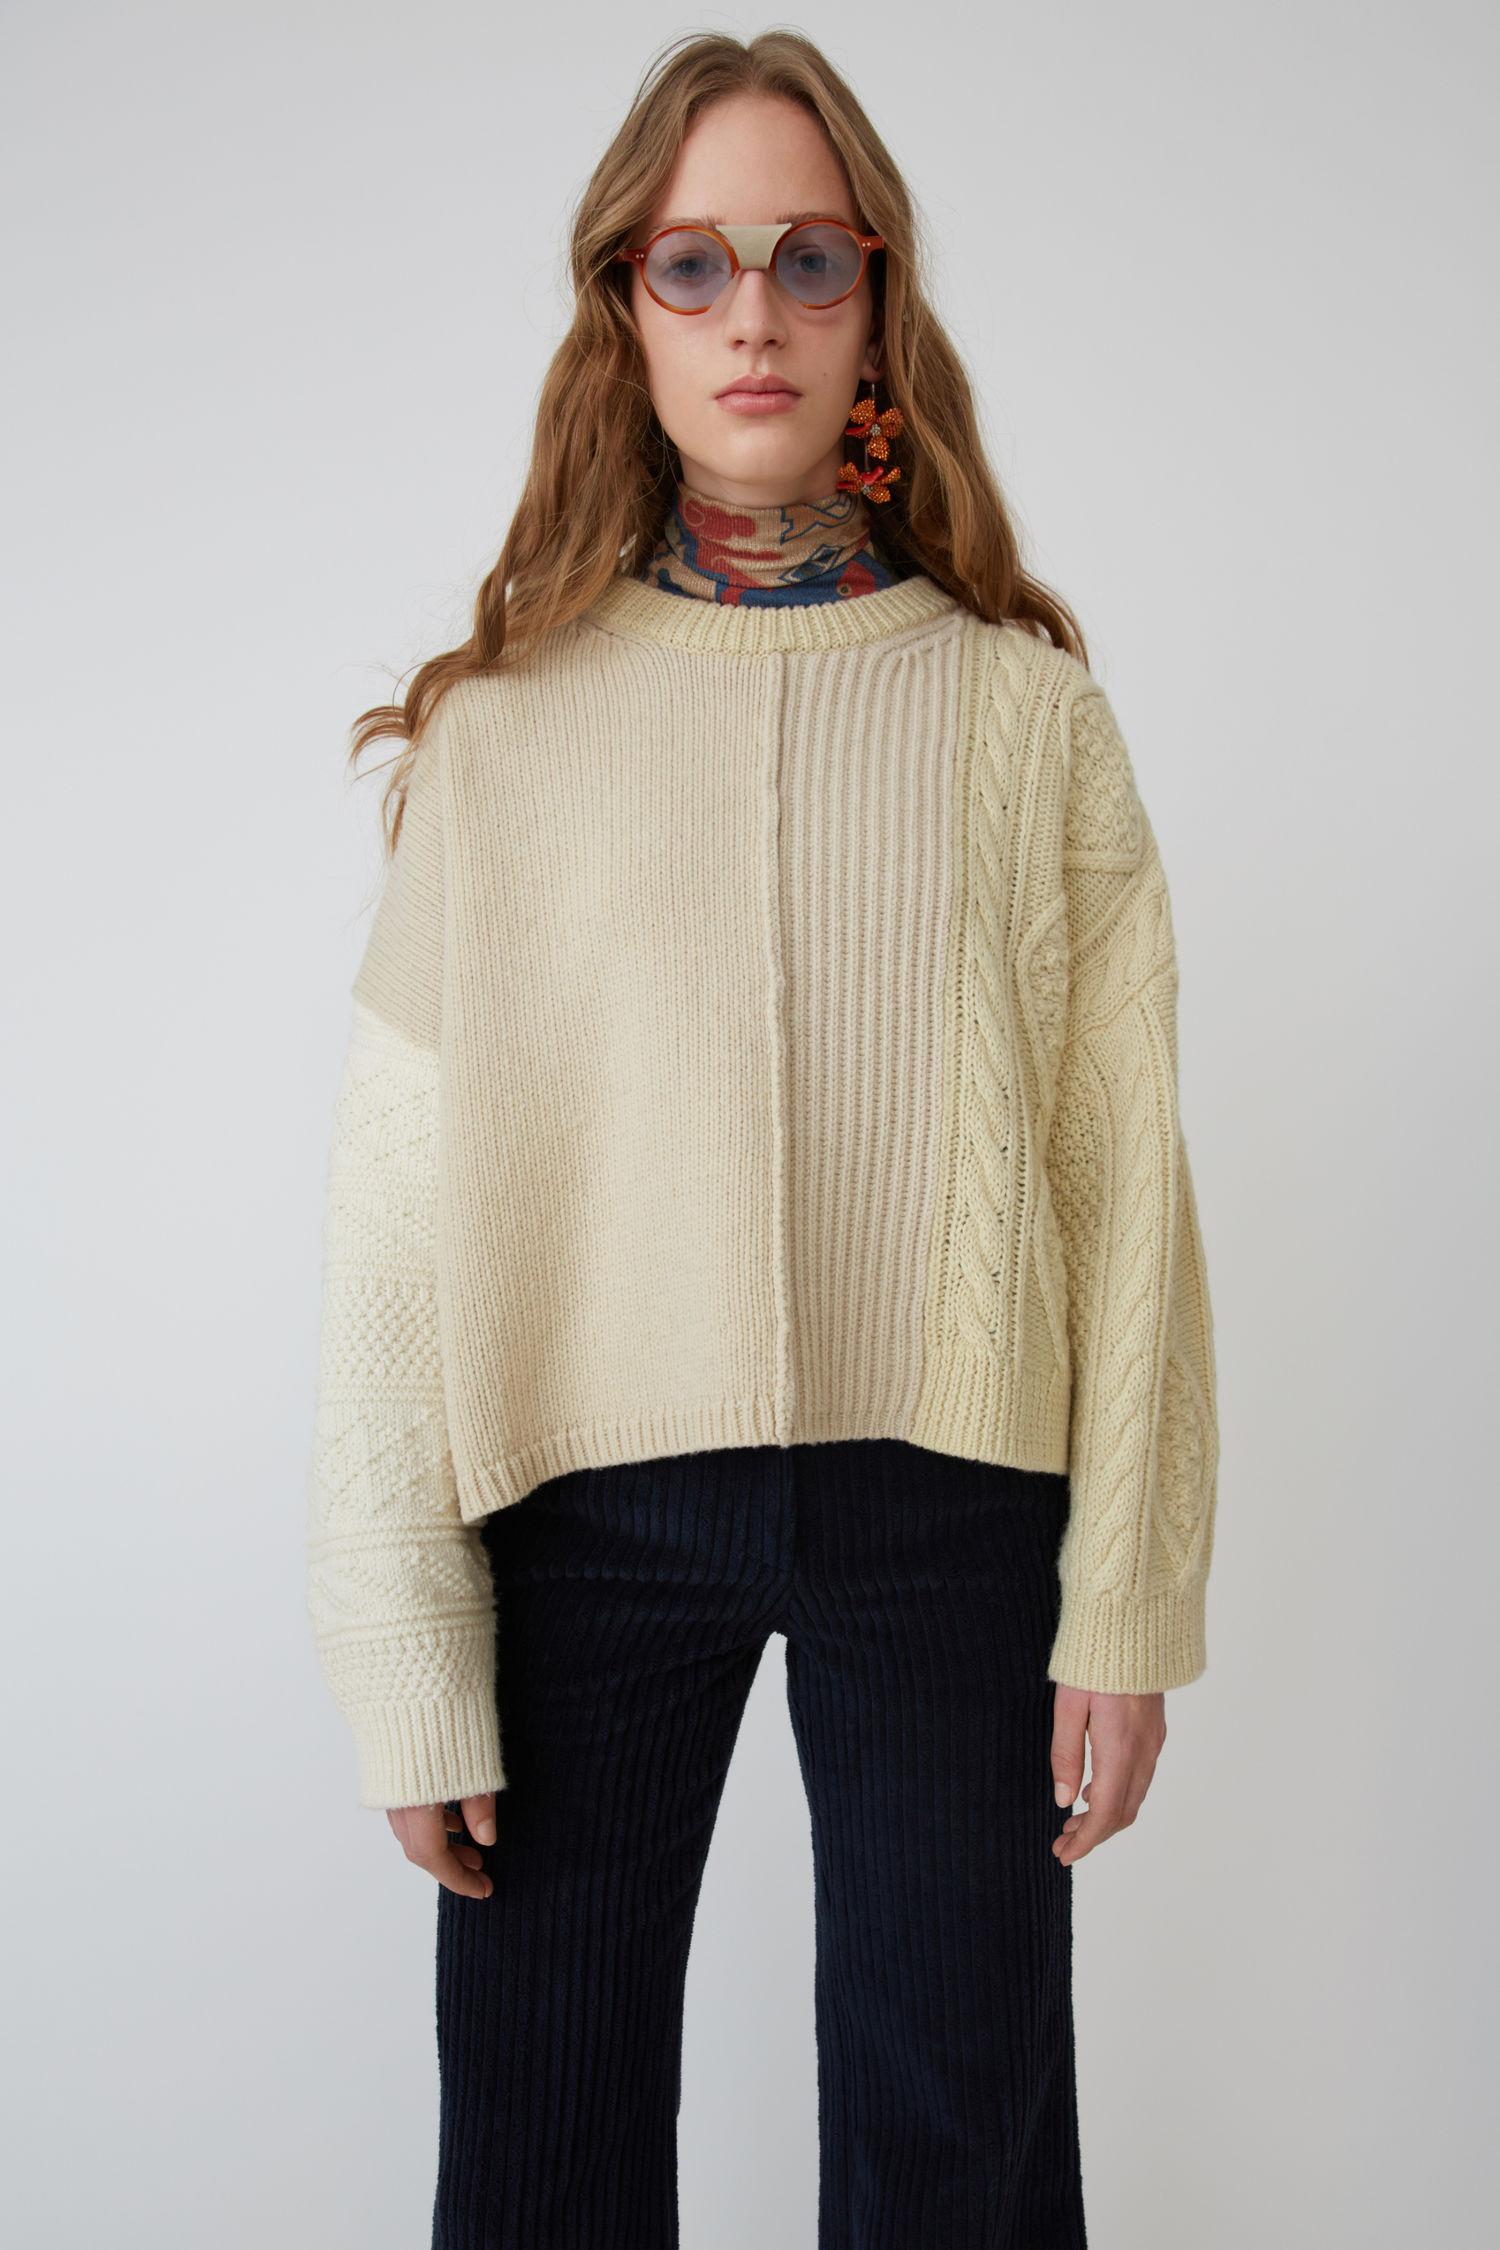 Textured Sweater White/Ecru